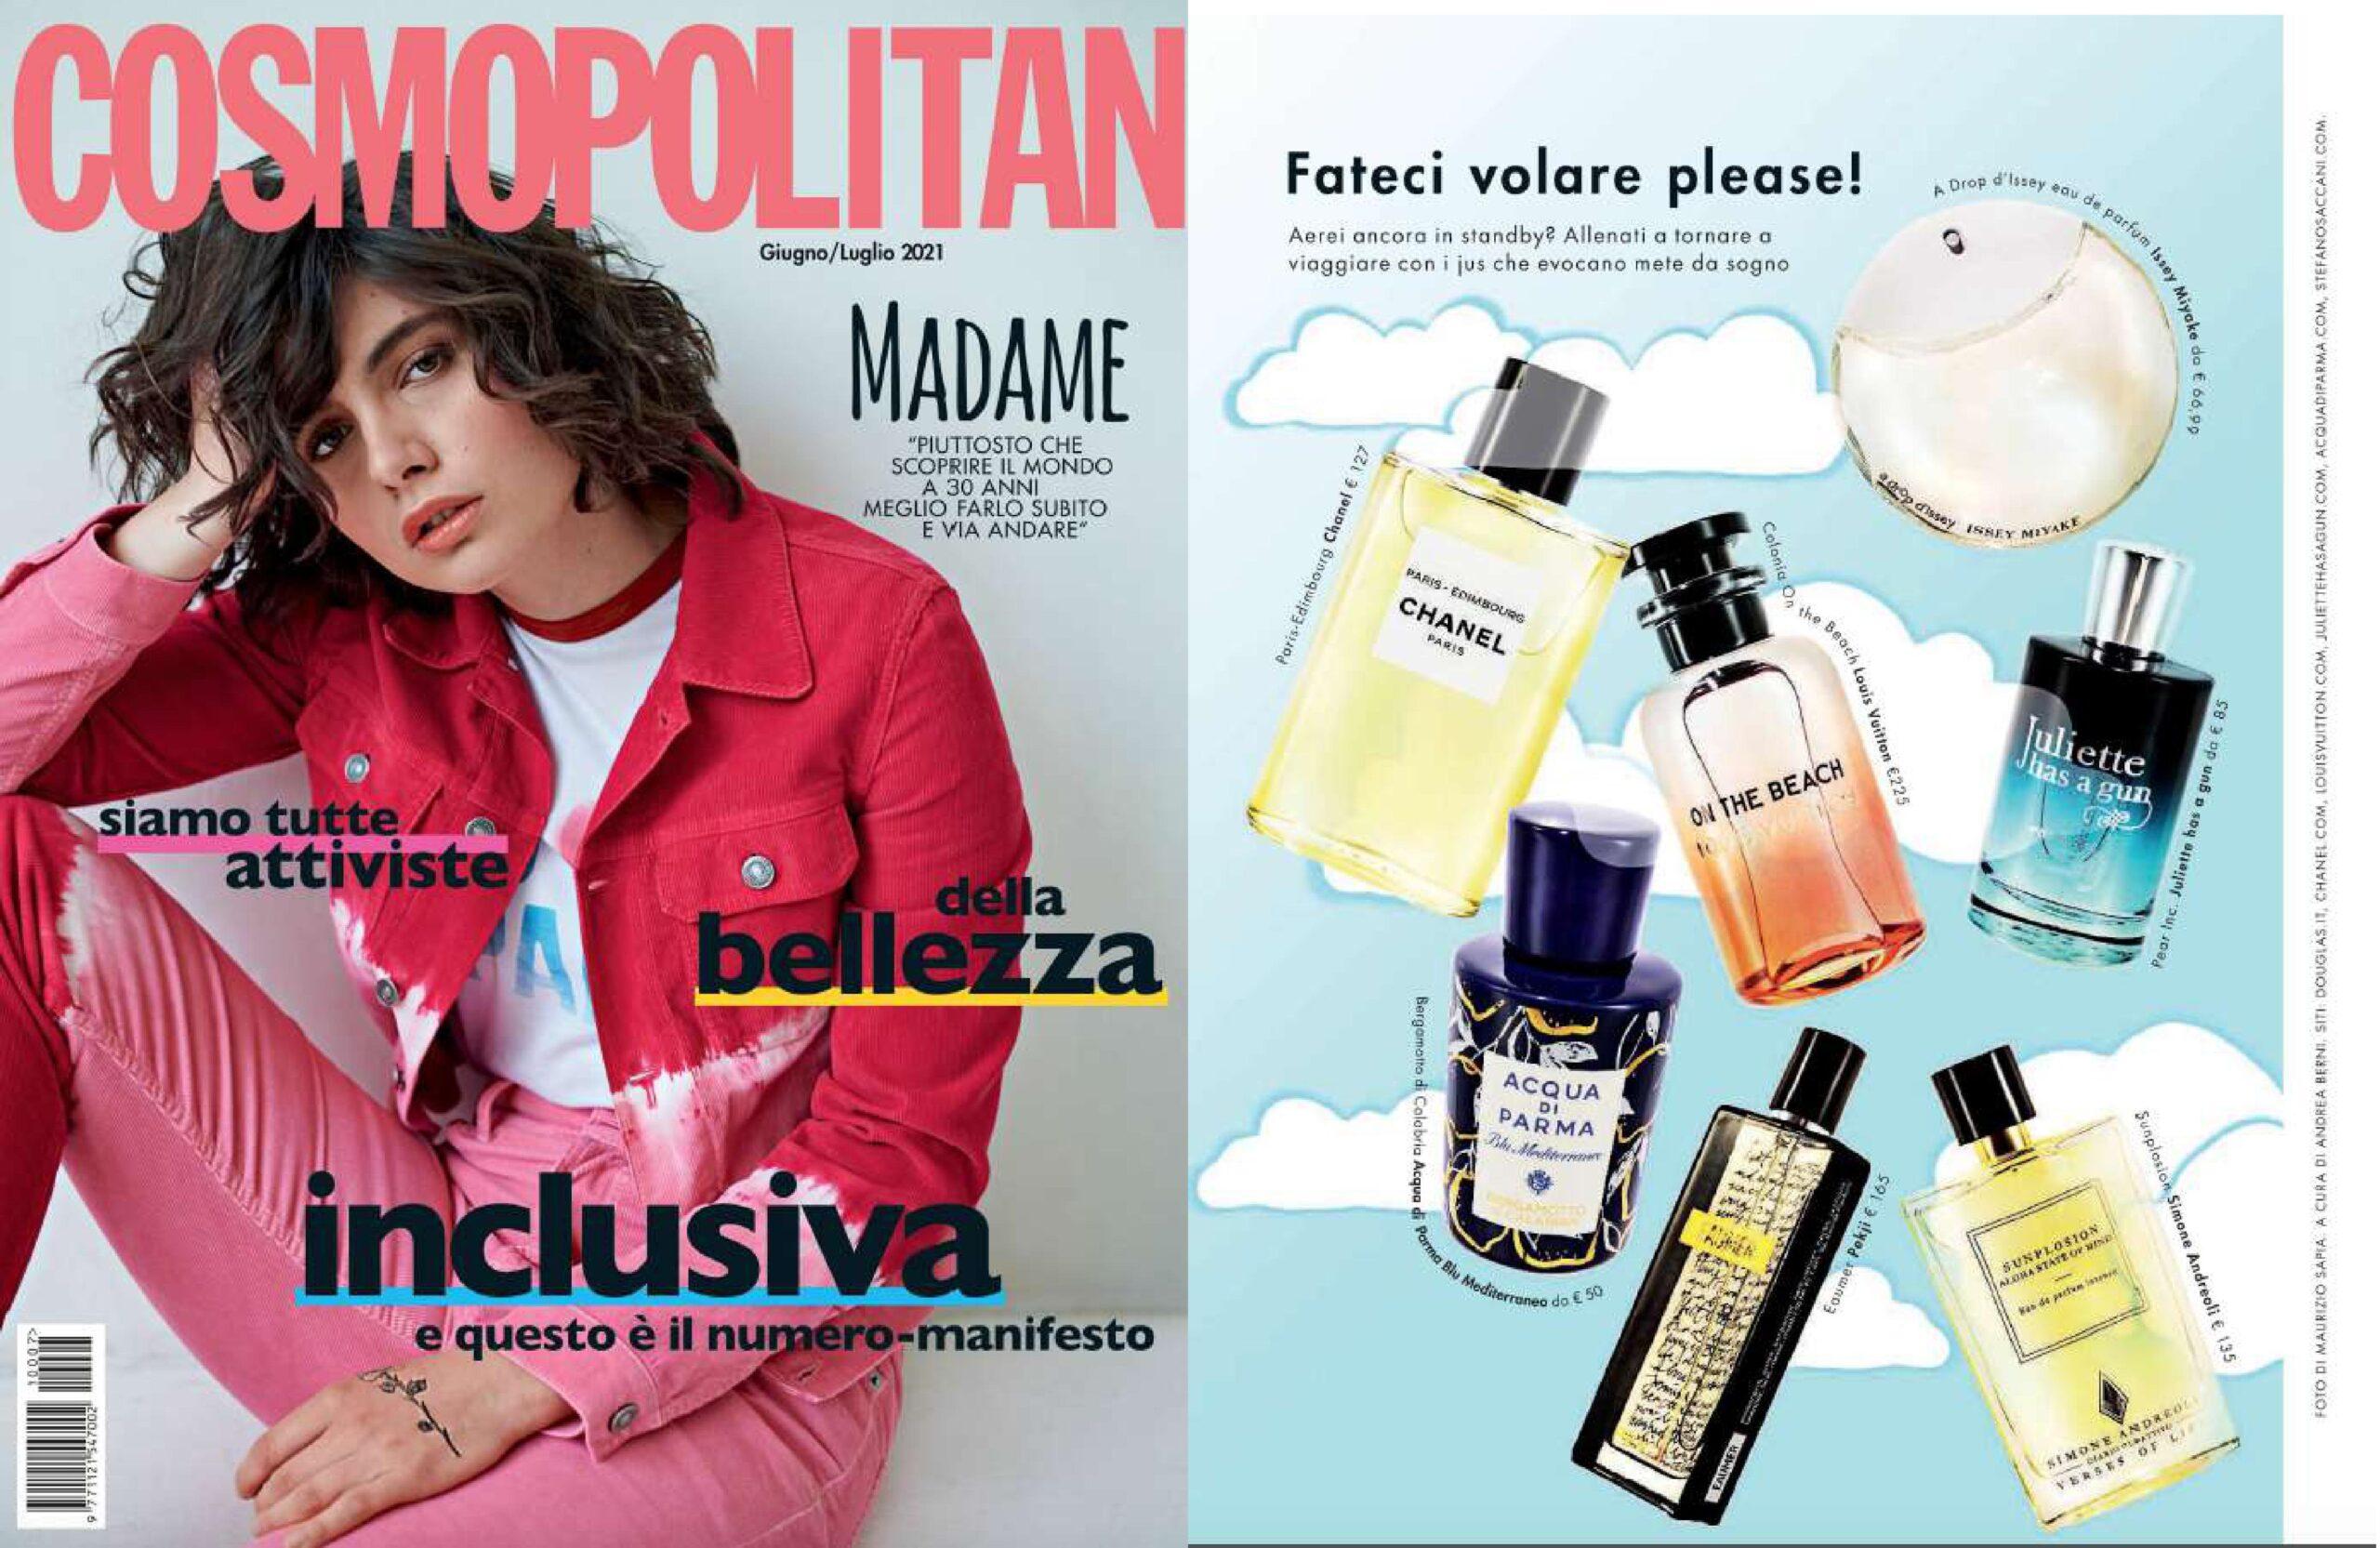 Simone Andreoli Sunplosion x Cosmopolitan